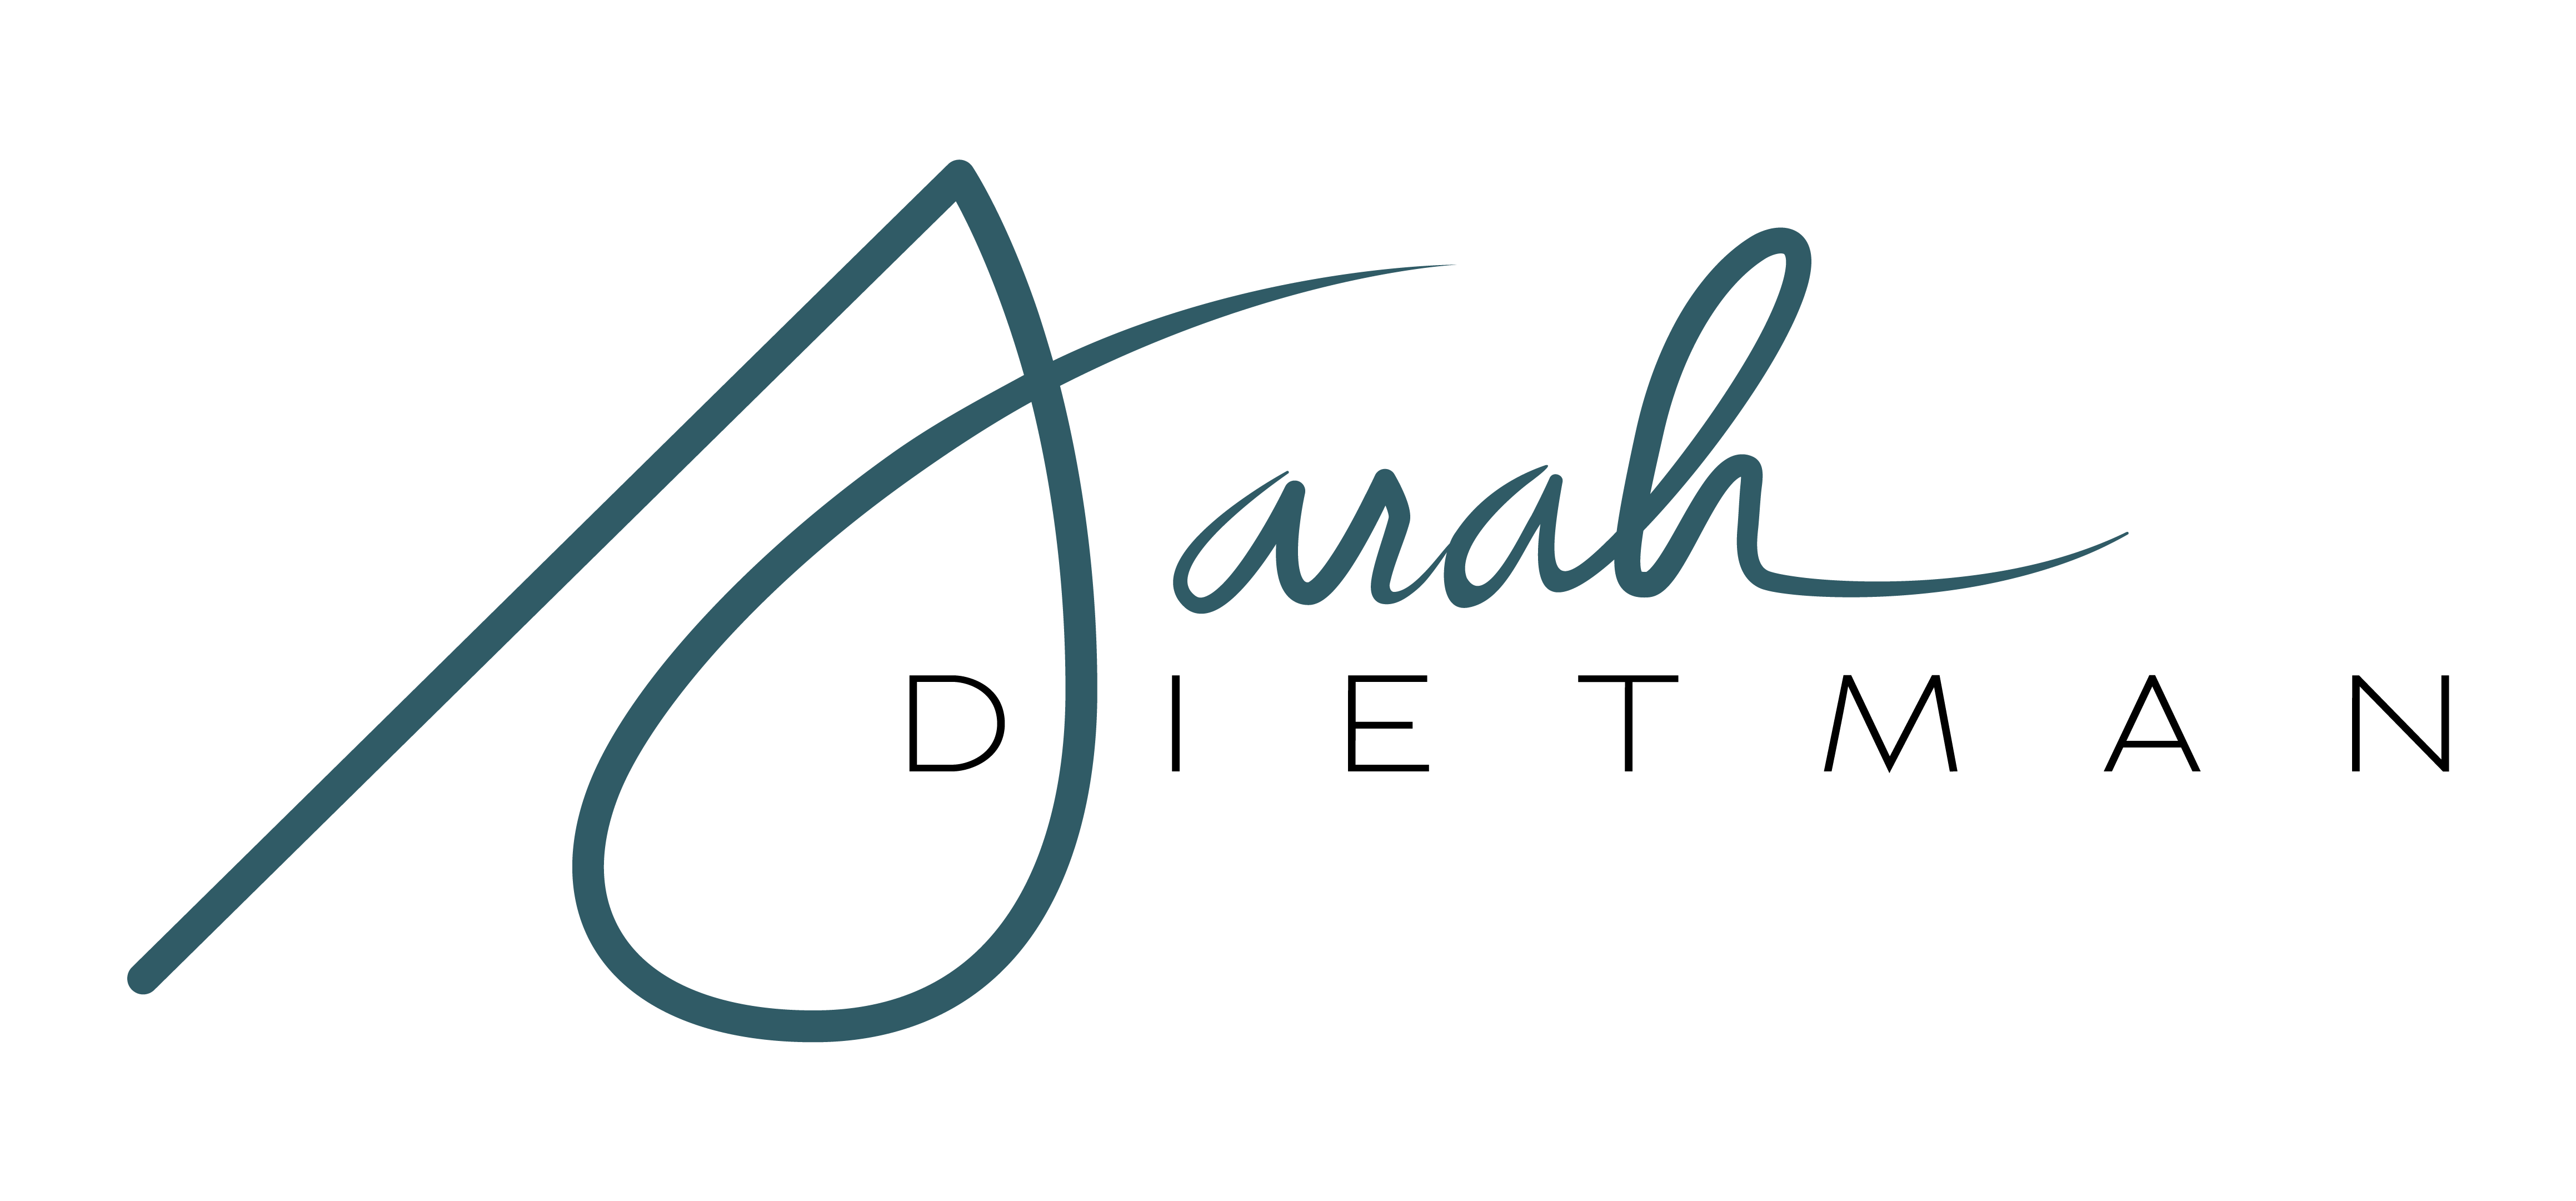 Sarah Dietman